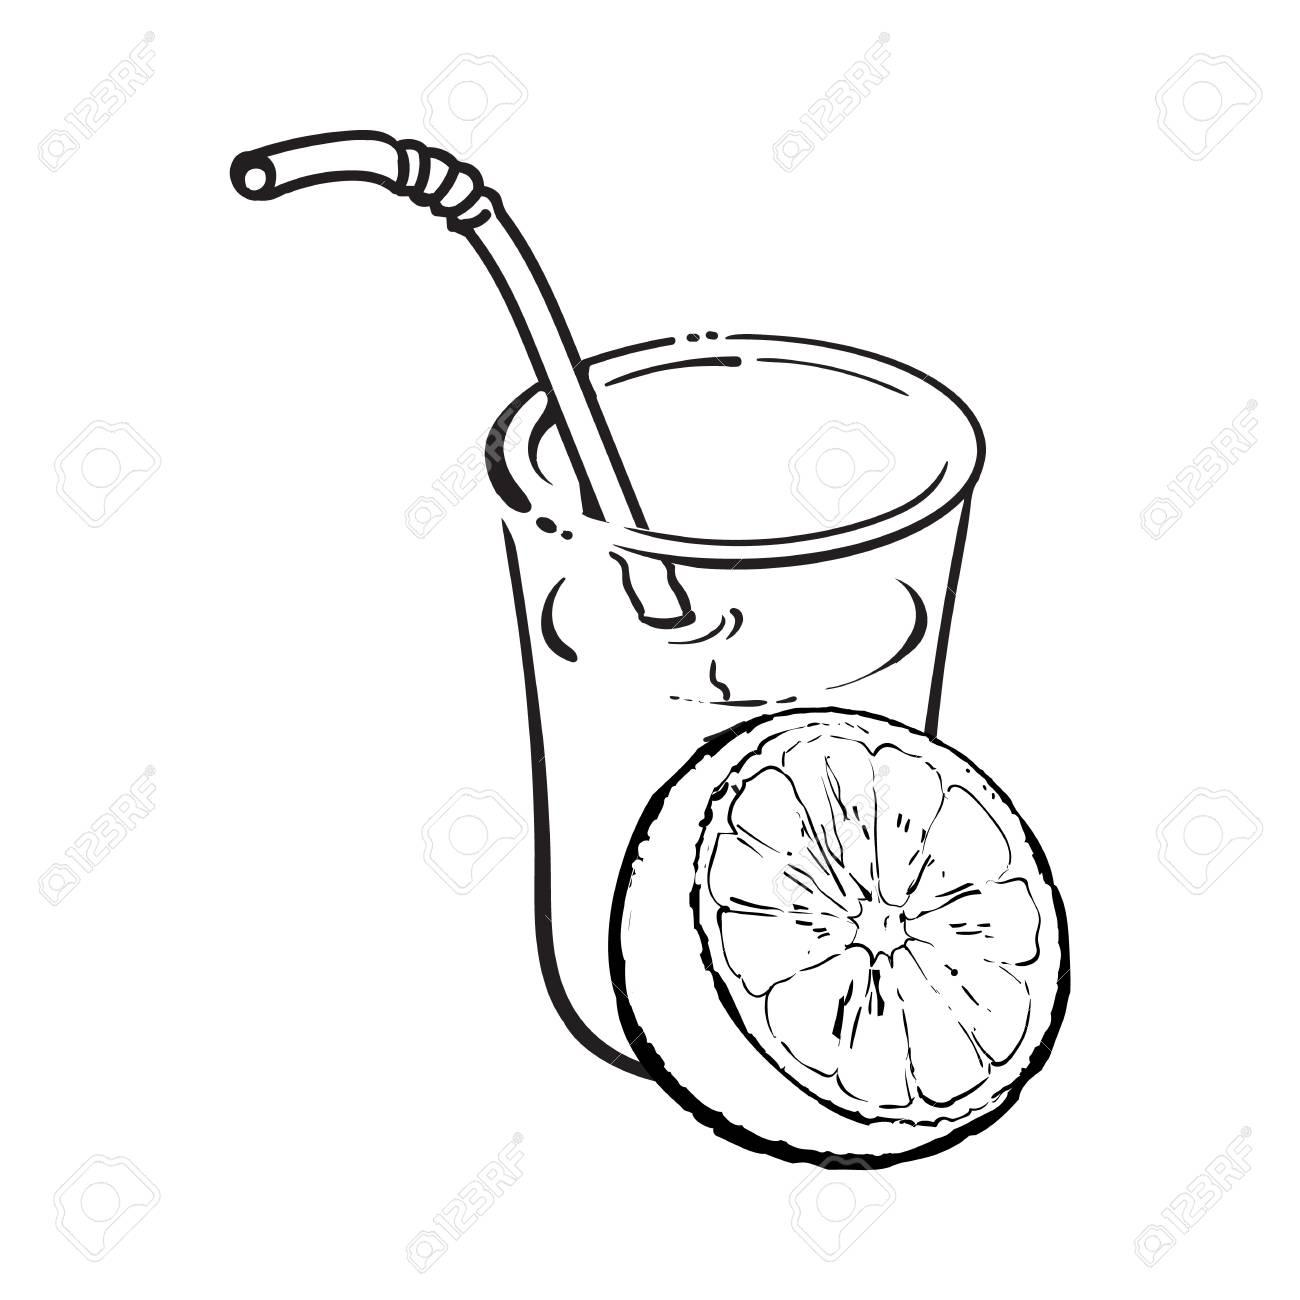 1300x1300 Glass Of Freshly Squeezed Juice With Half Of Orange, Sketch Vector